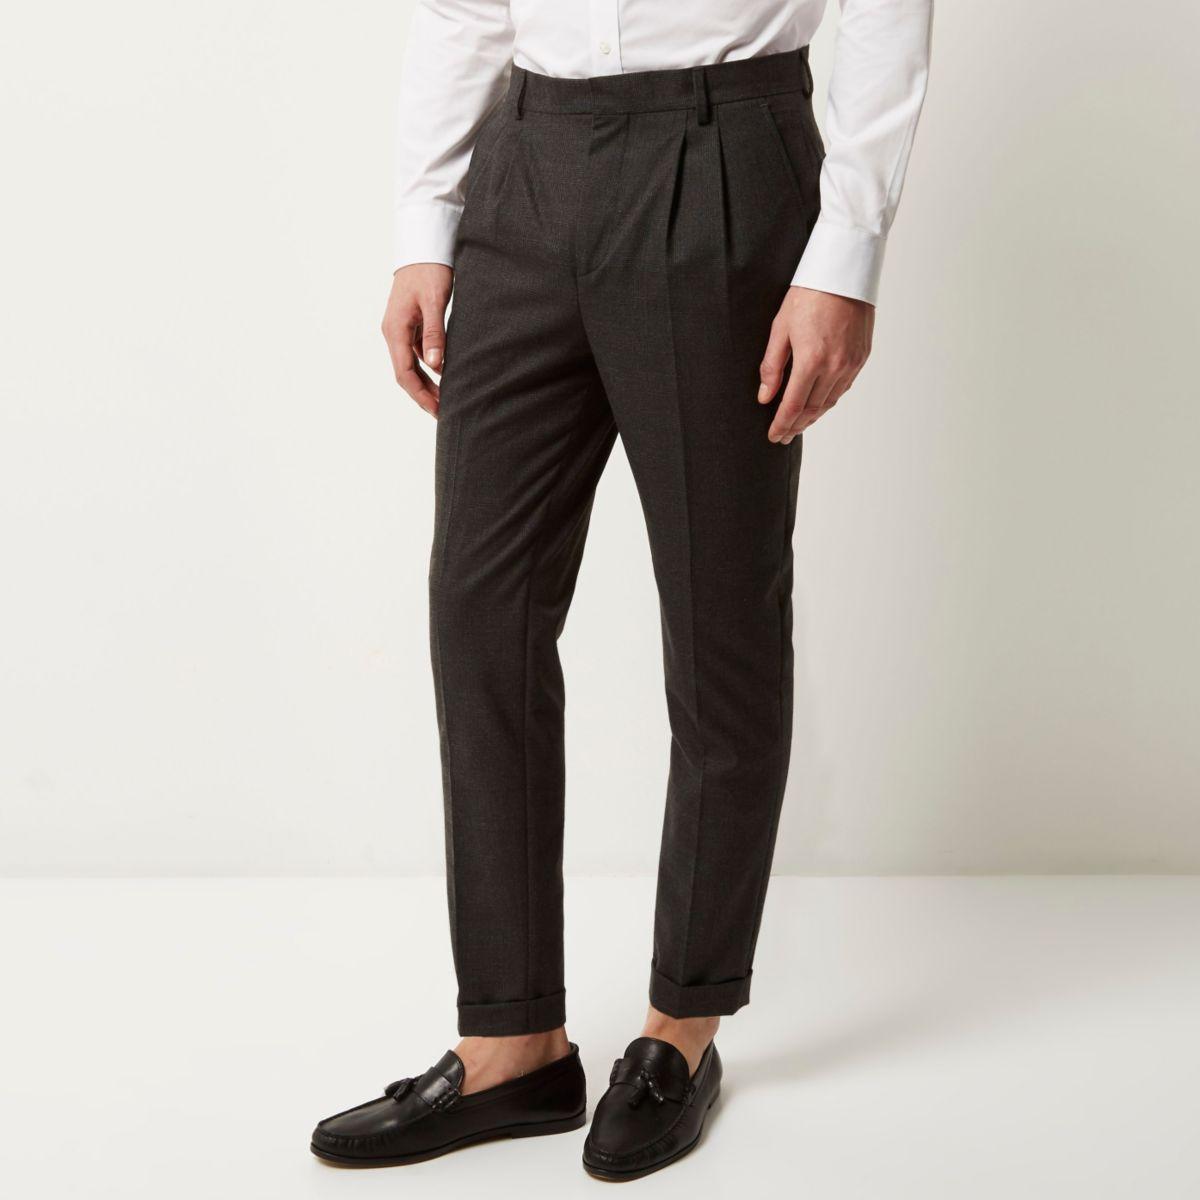 Grey smart Prince of Wales slim pants